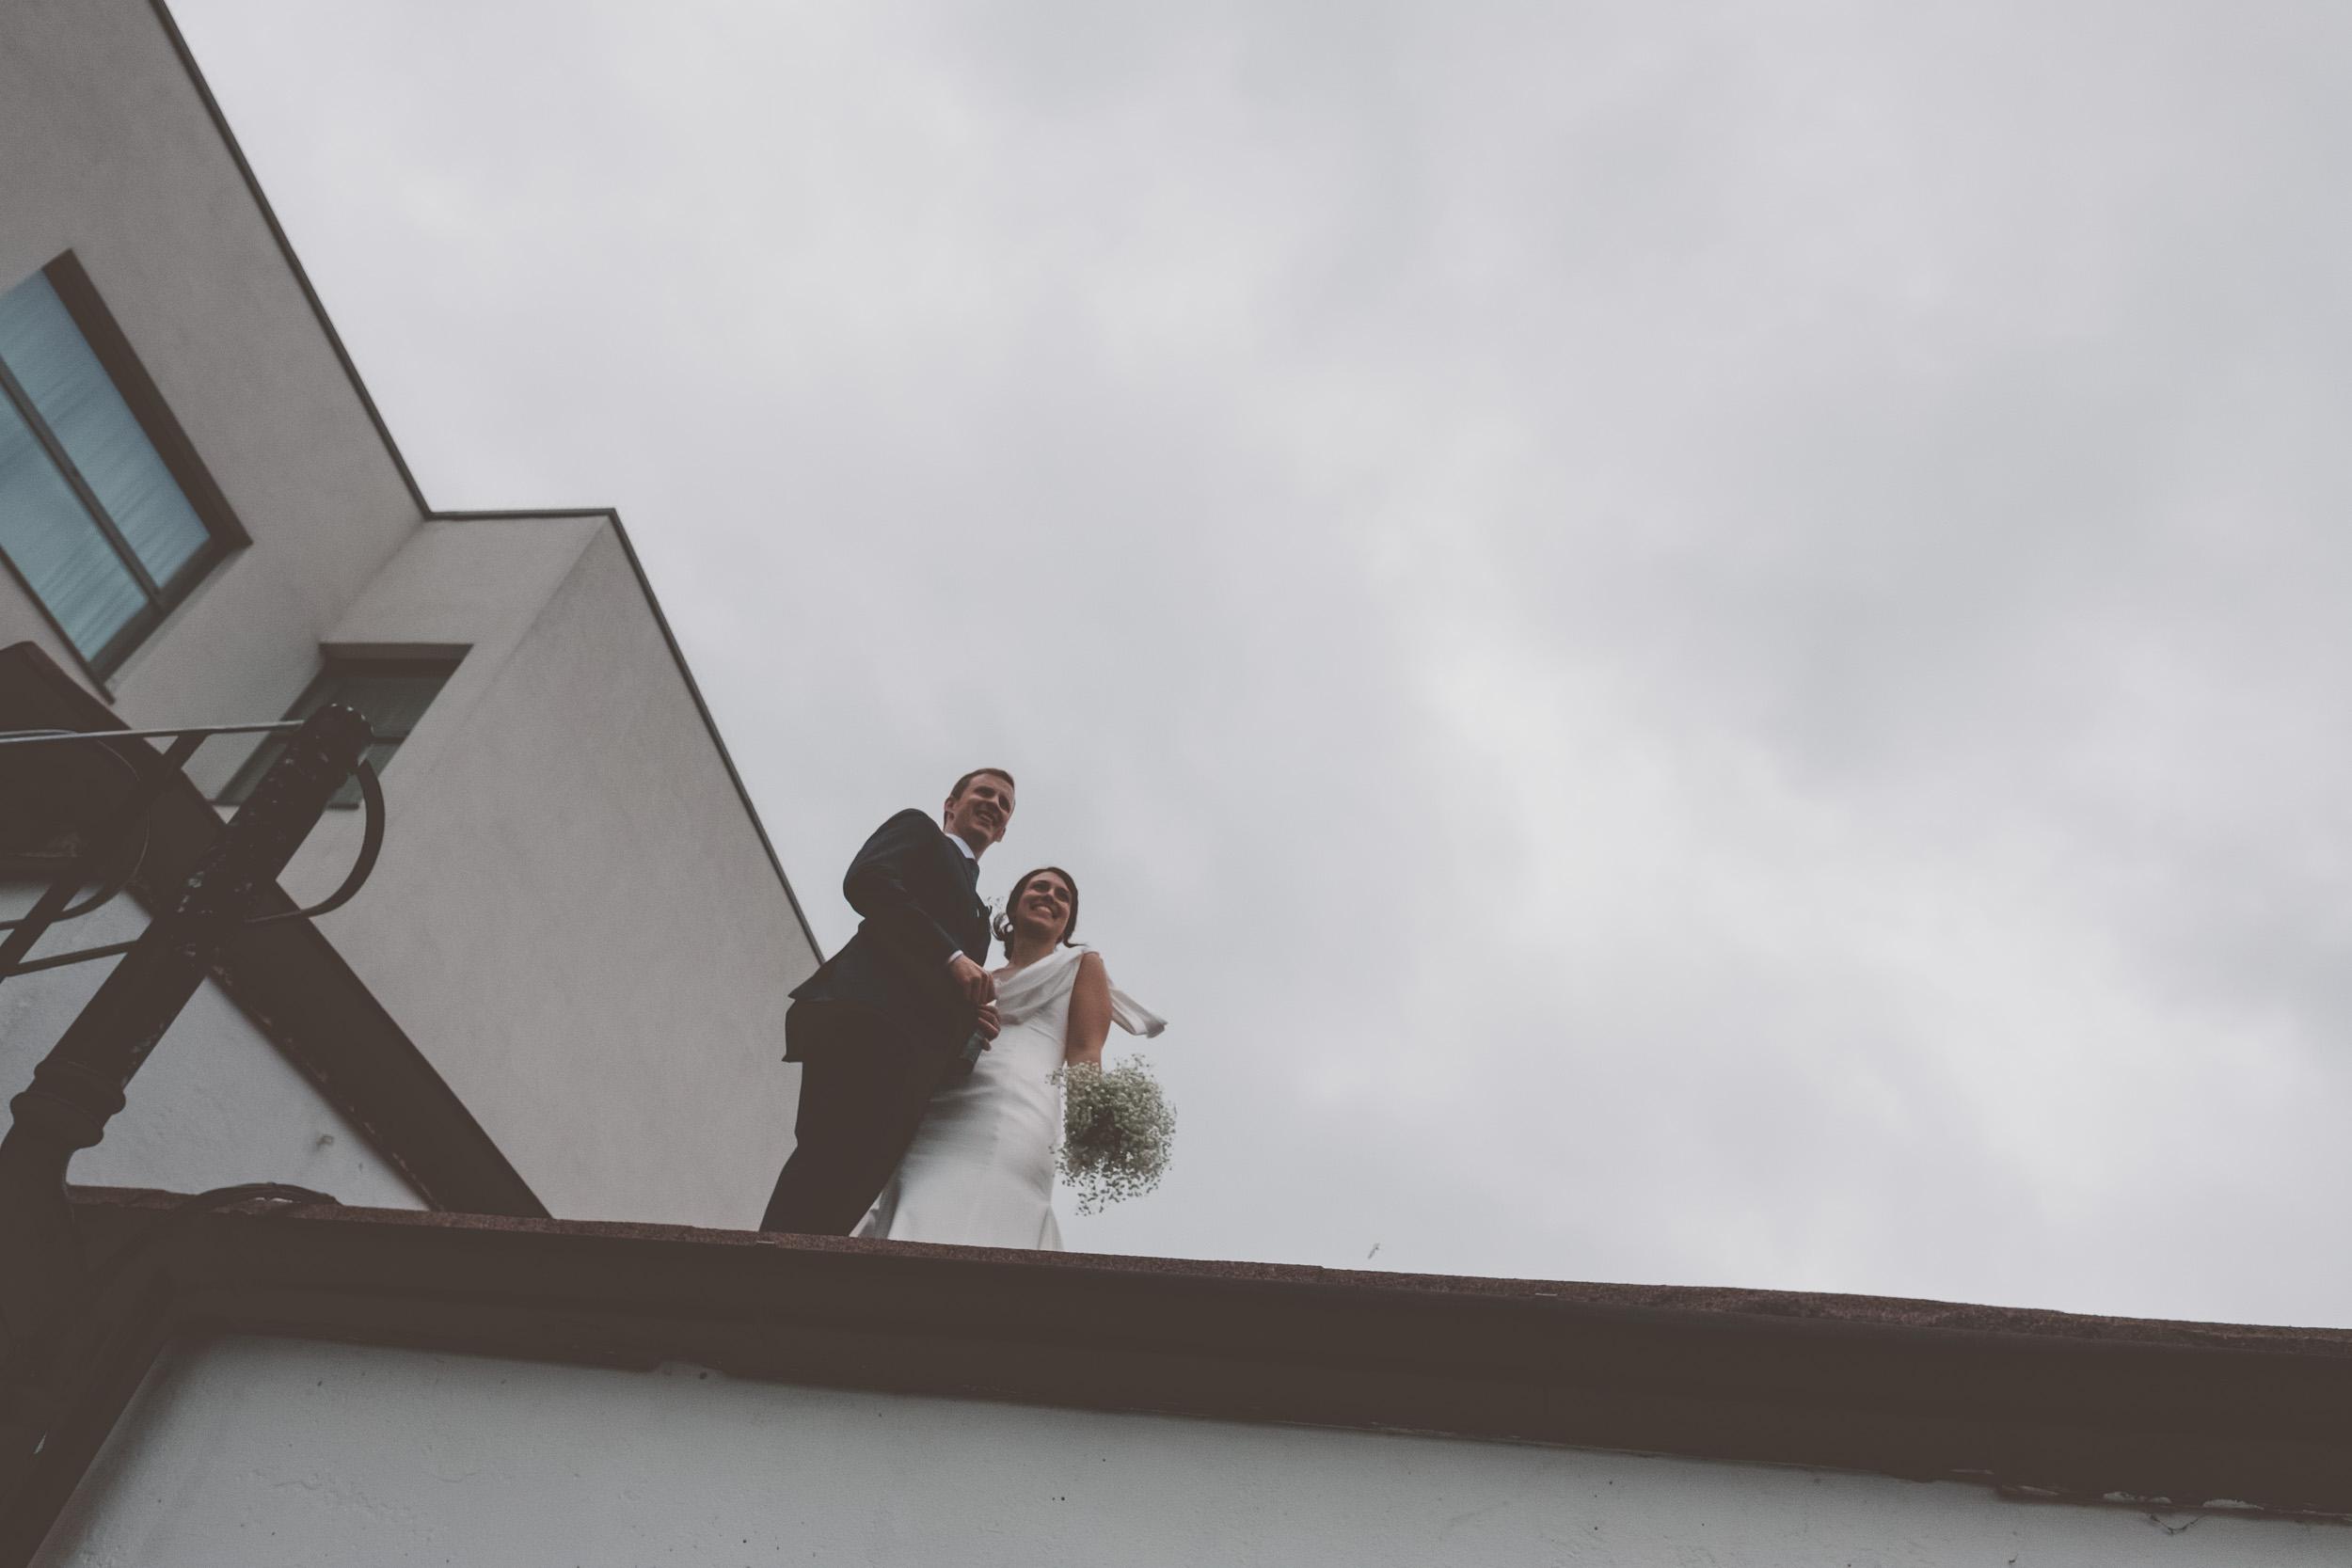 islington-town-hall-4th-floor-studios-wedding245.jpg